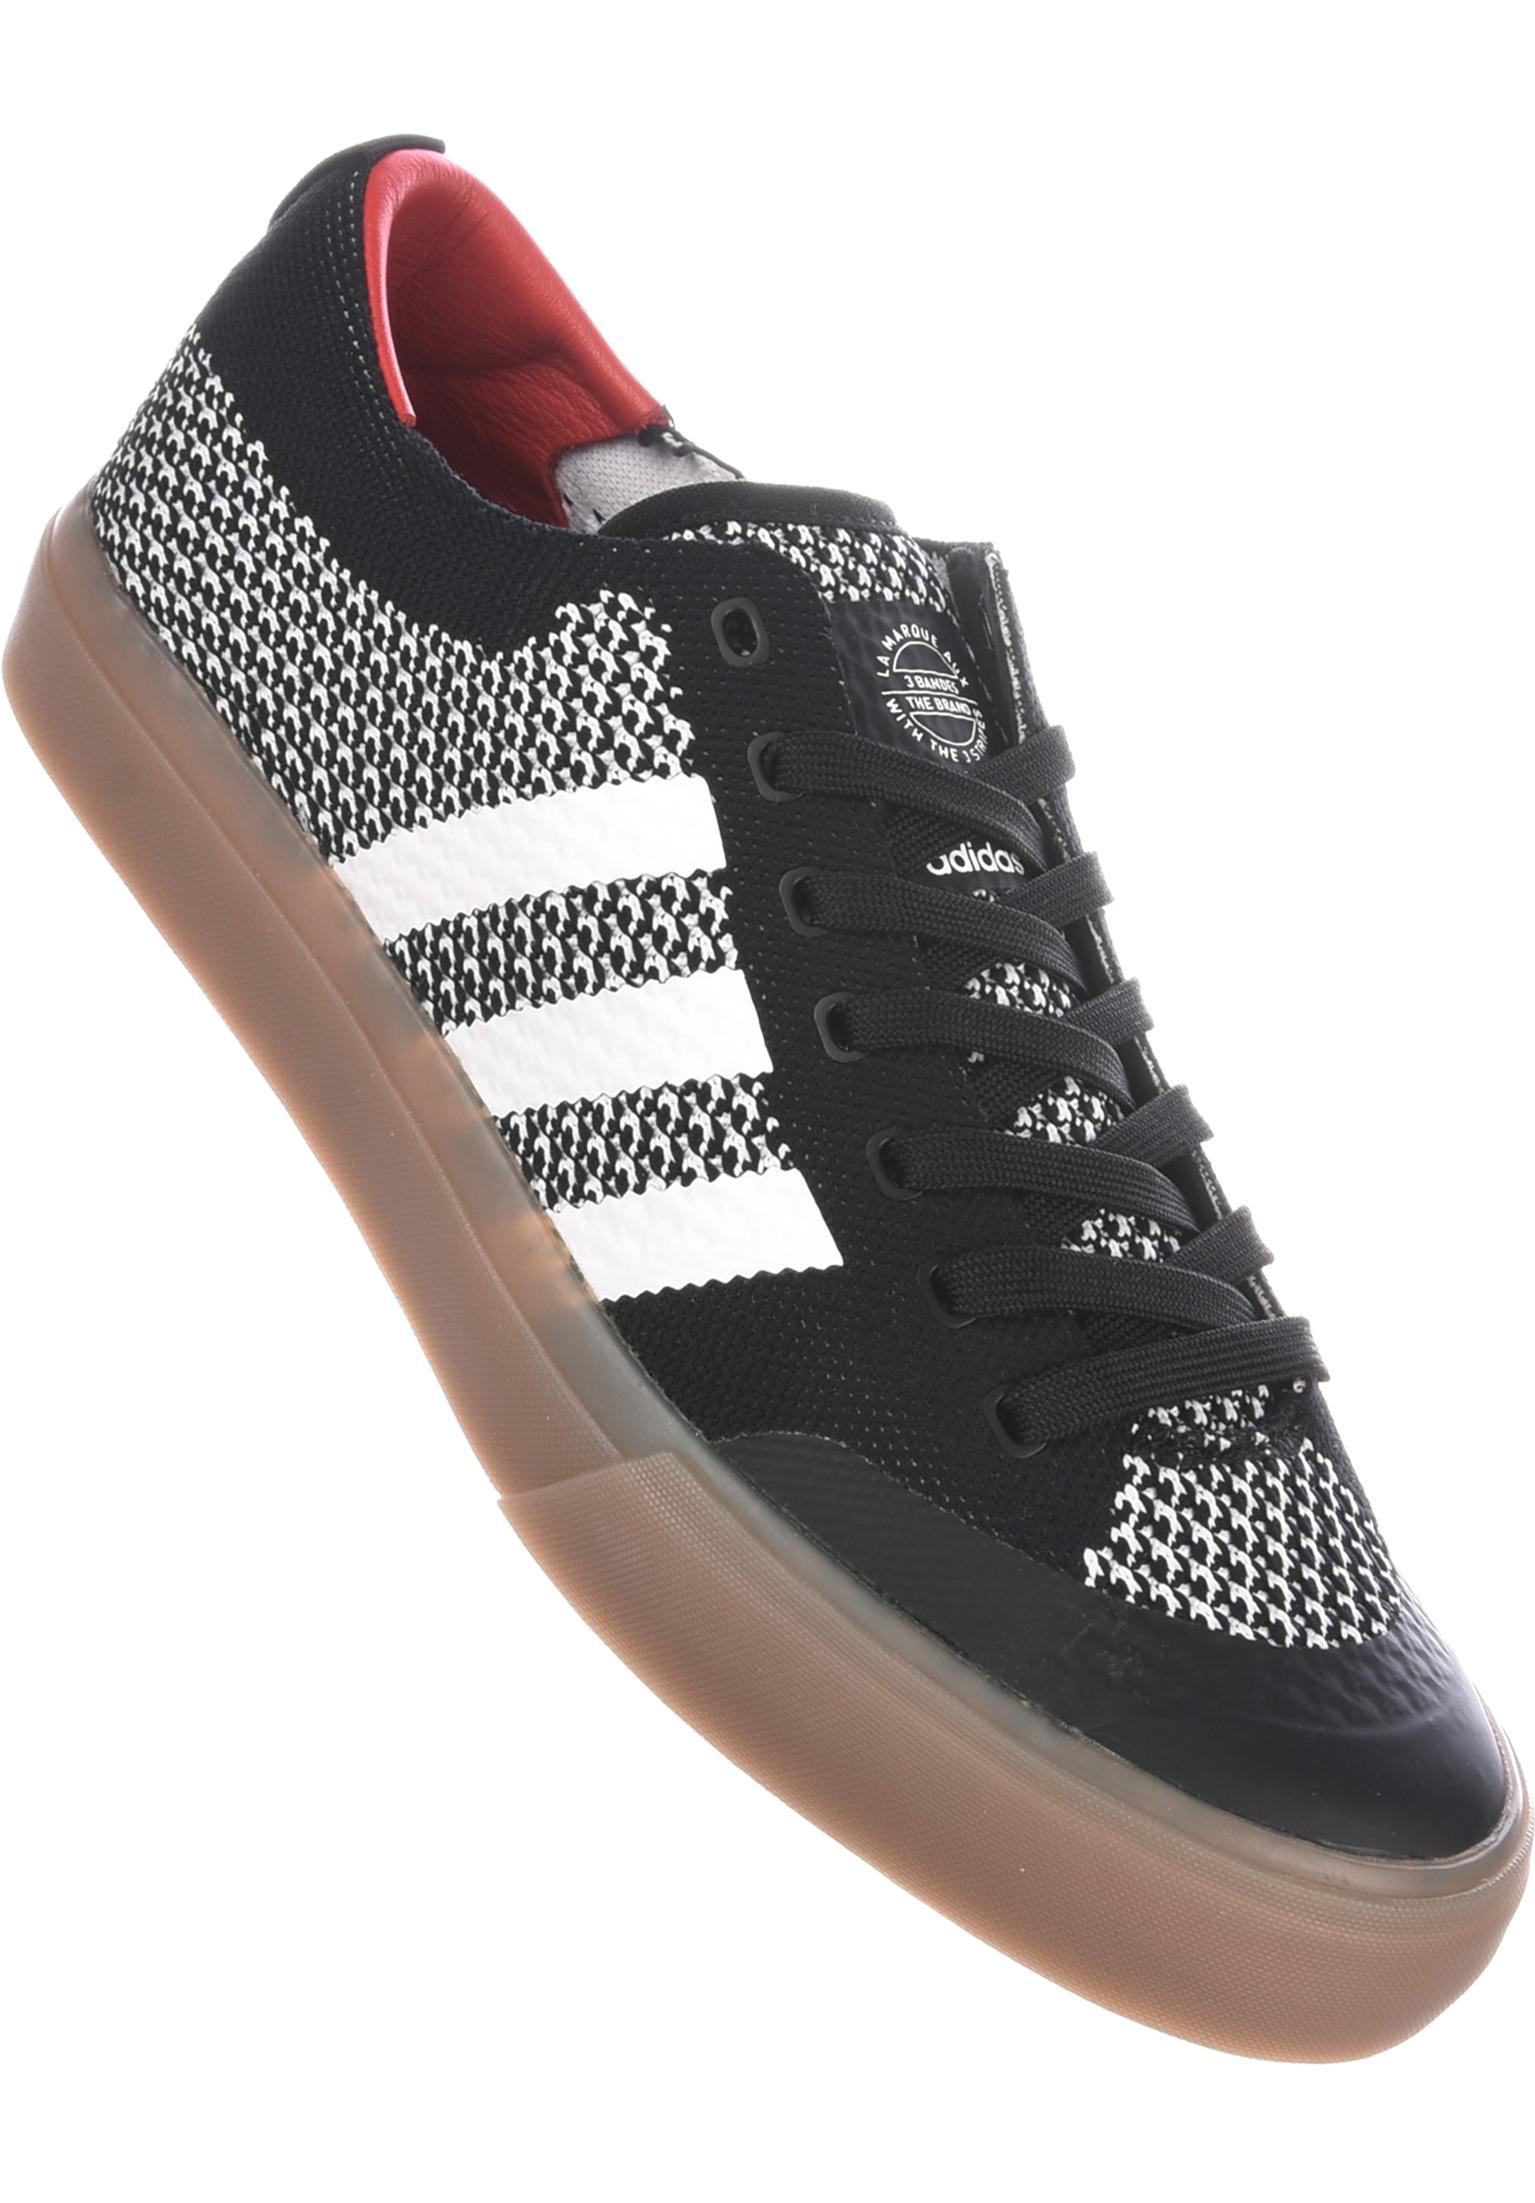 853587a153ee Matchcourt Primeknit adidas-skateboarding All Shoes in coreblack-gum for Men